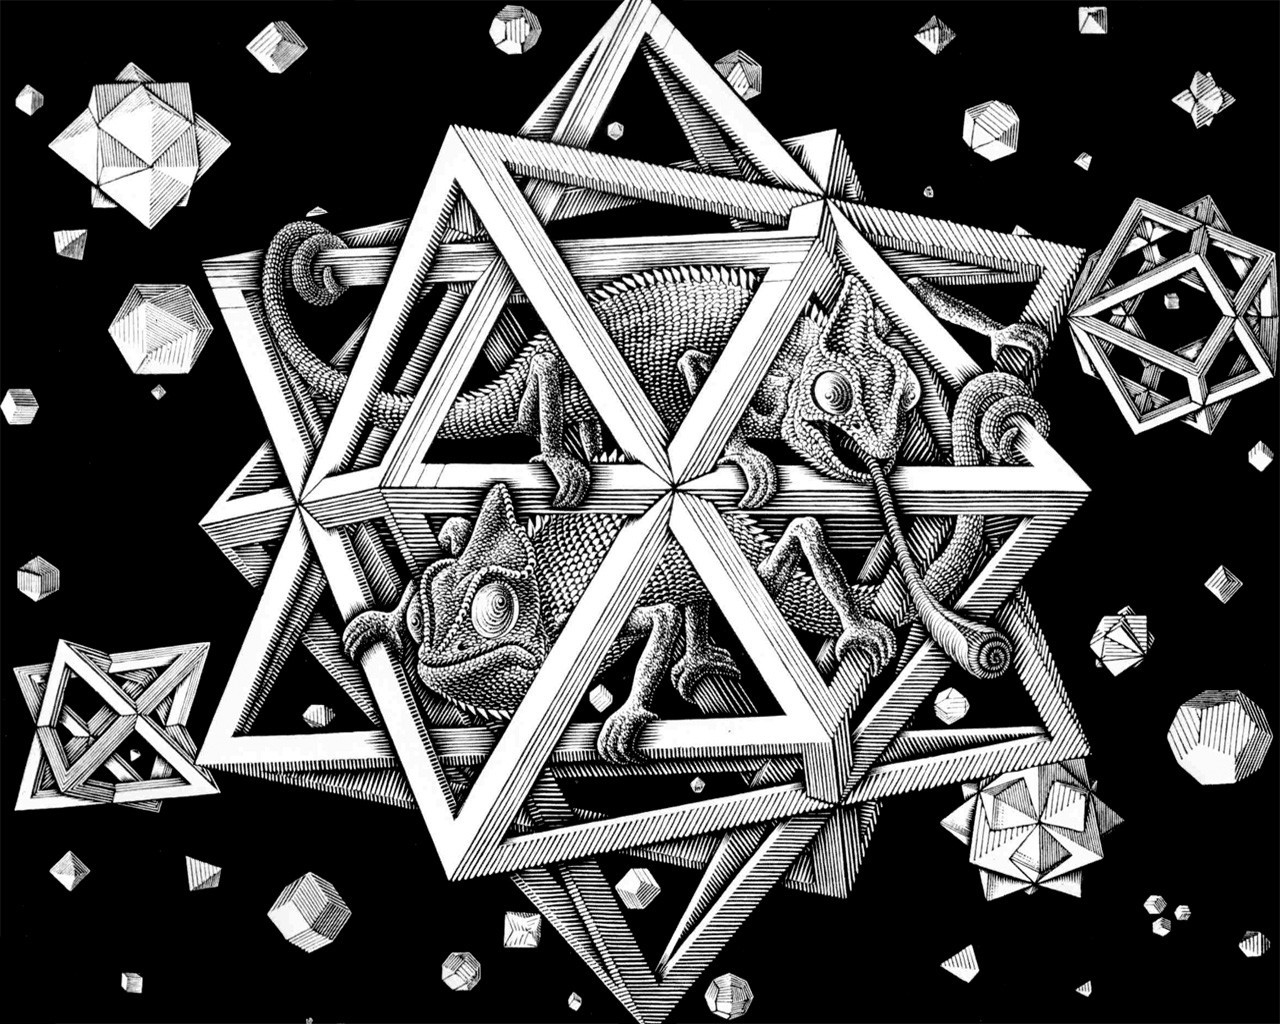 Drawn optical illusion geometric Background Animals C Illusion